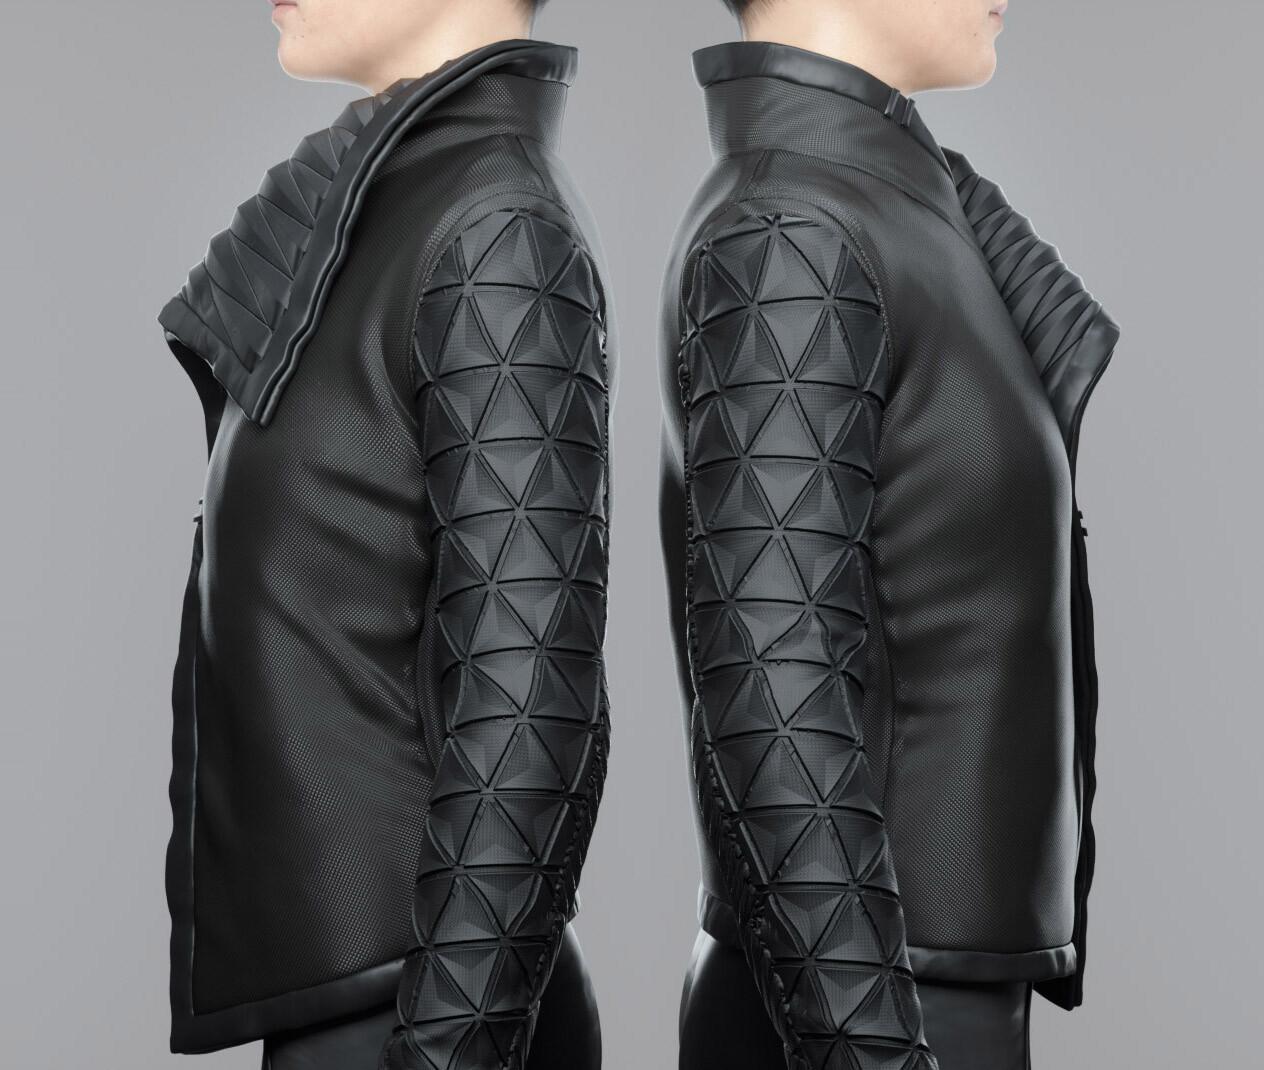 Cyberpunk Female Jacket. Back To Back. Geosphere pattern sleeves for that true Cyberpunk Aesthetic.